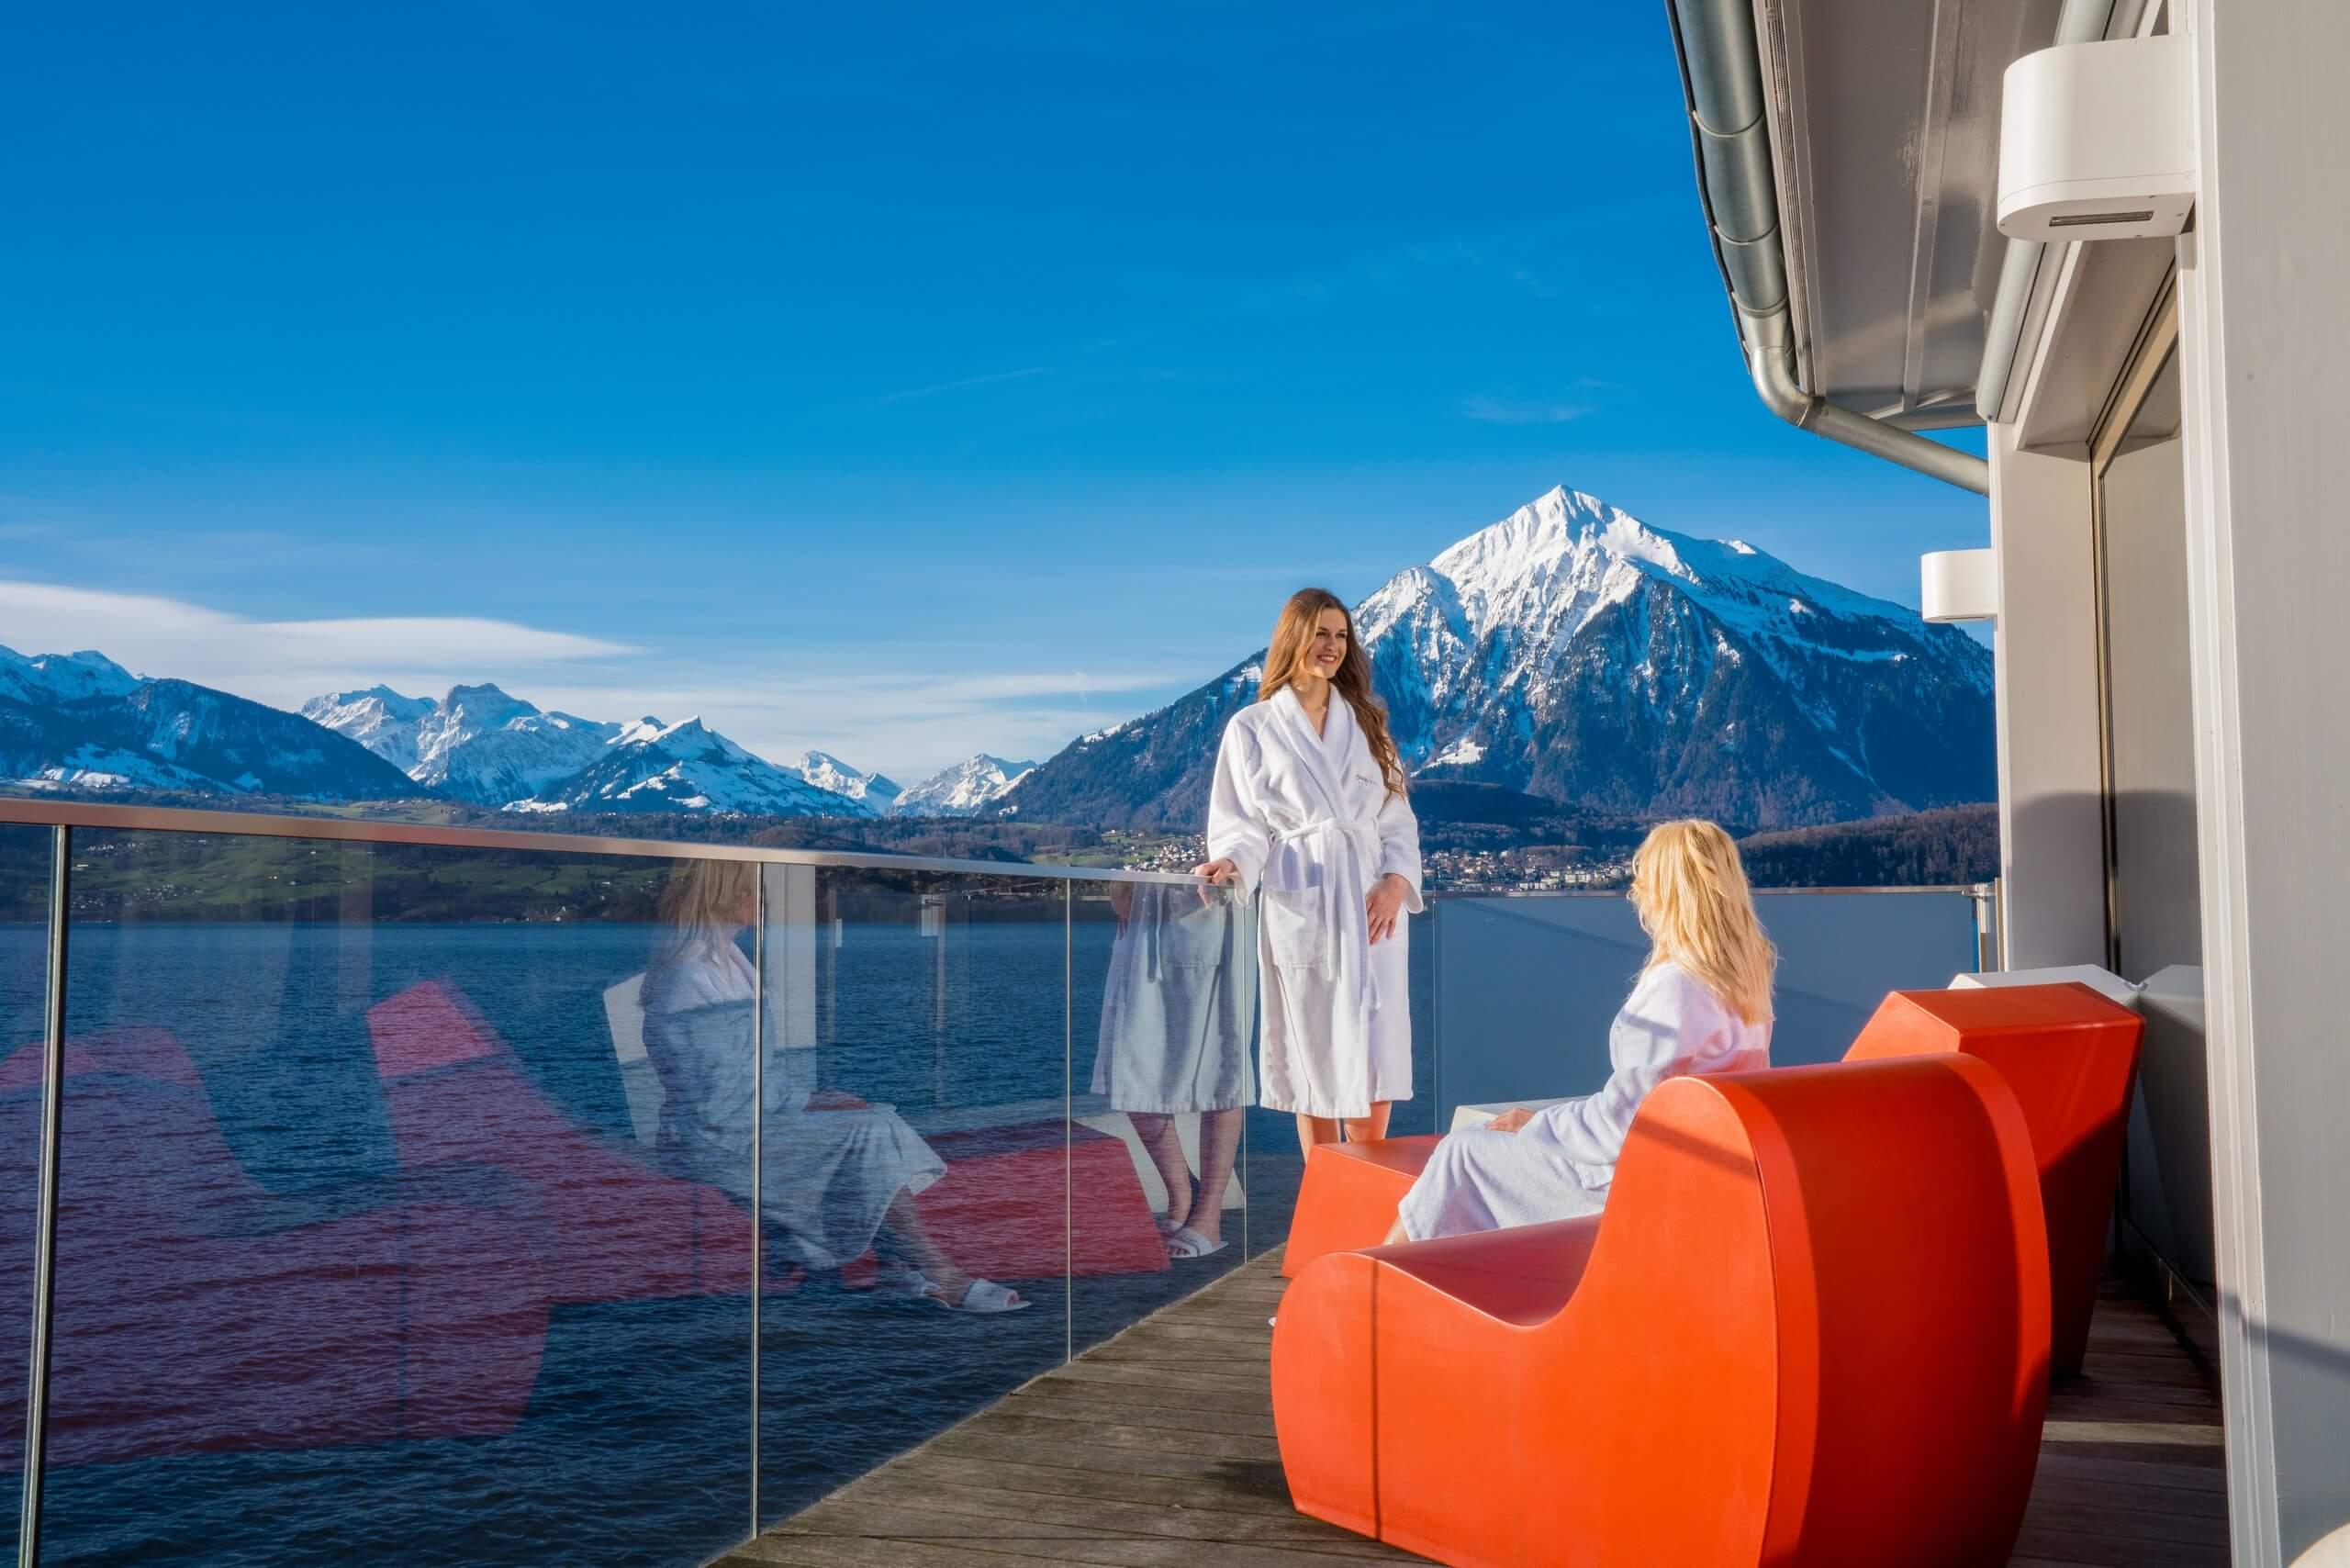 parkhotel-gunten-wellness-winter-bootshaus-niesen-thunersee